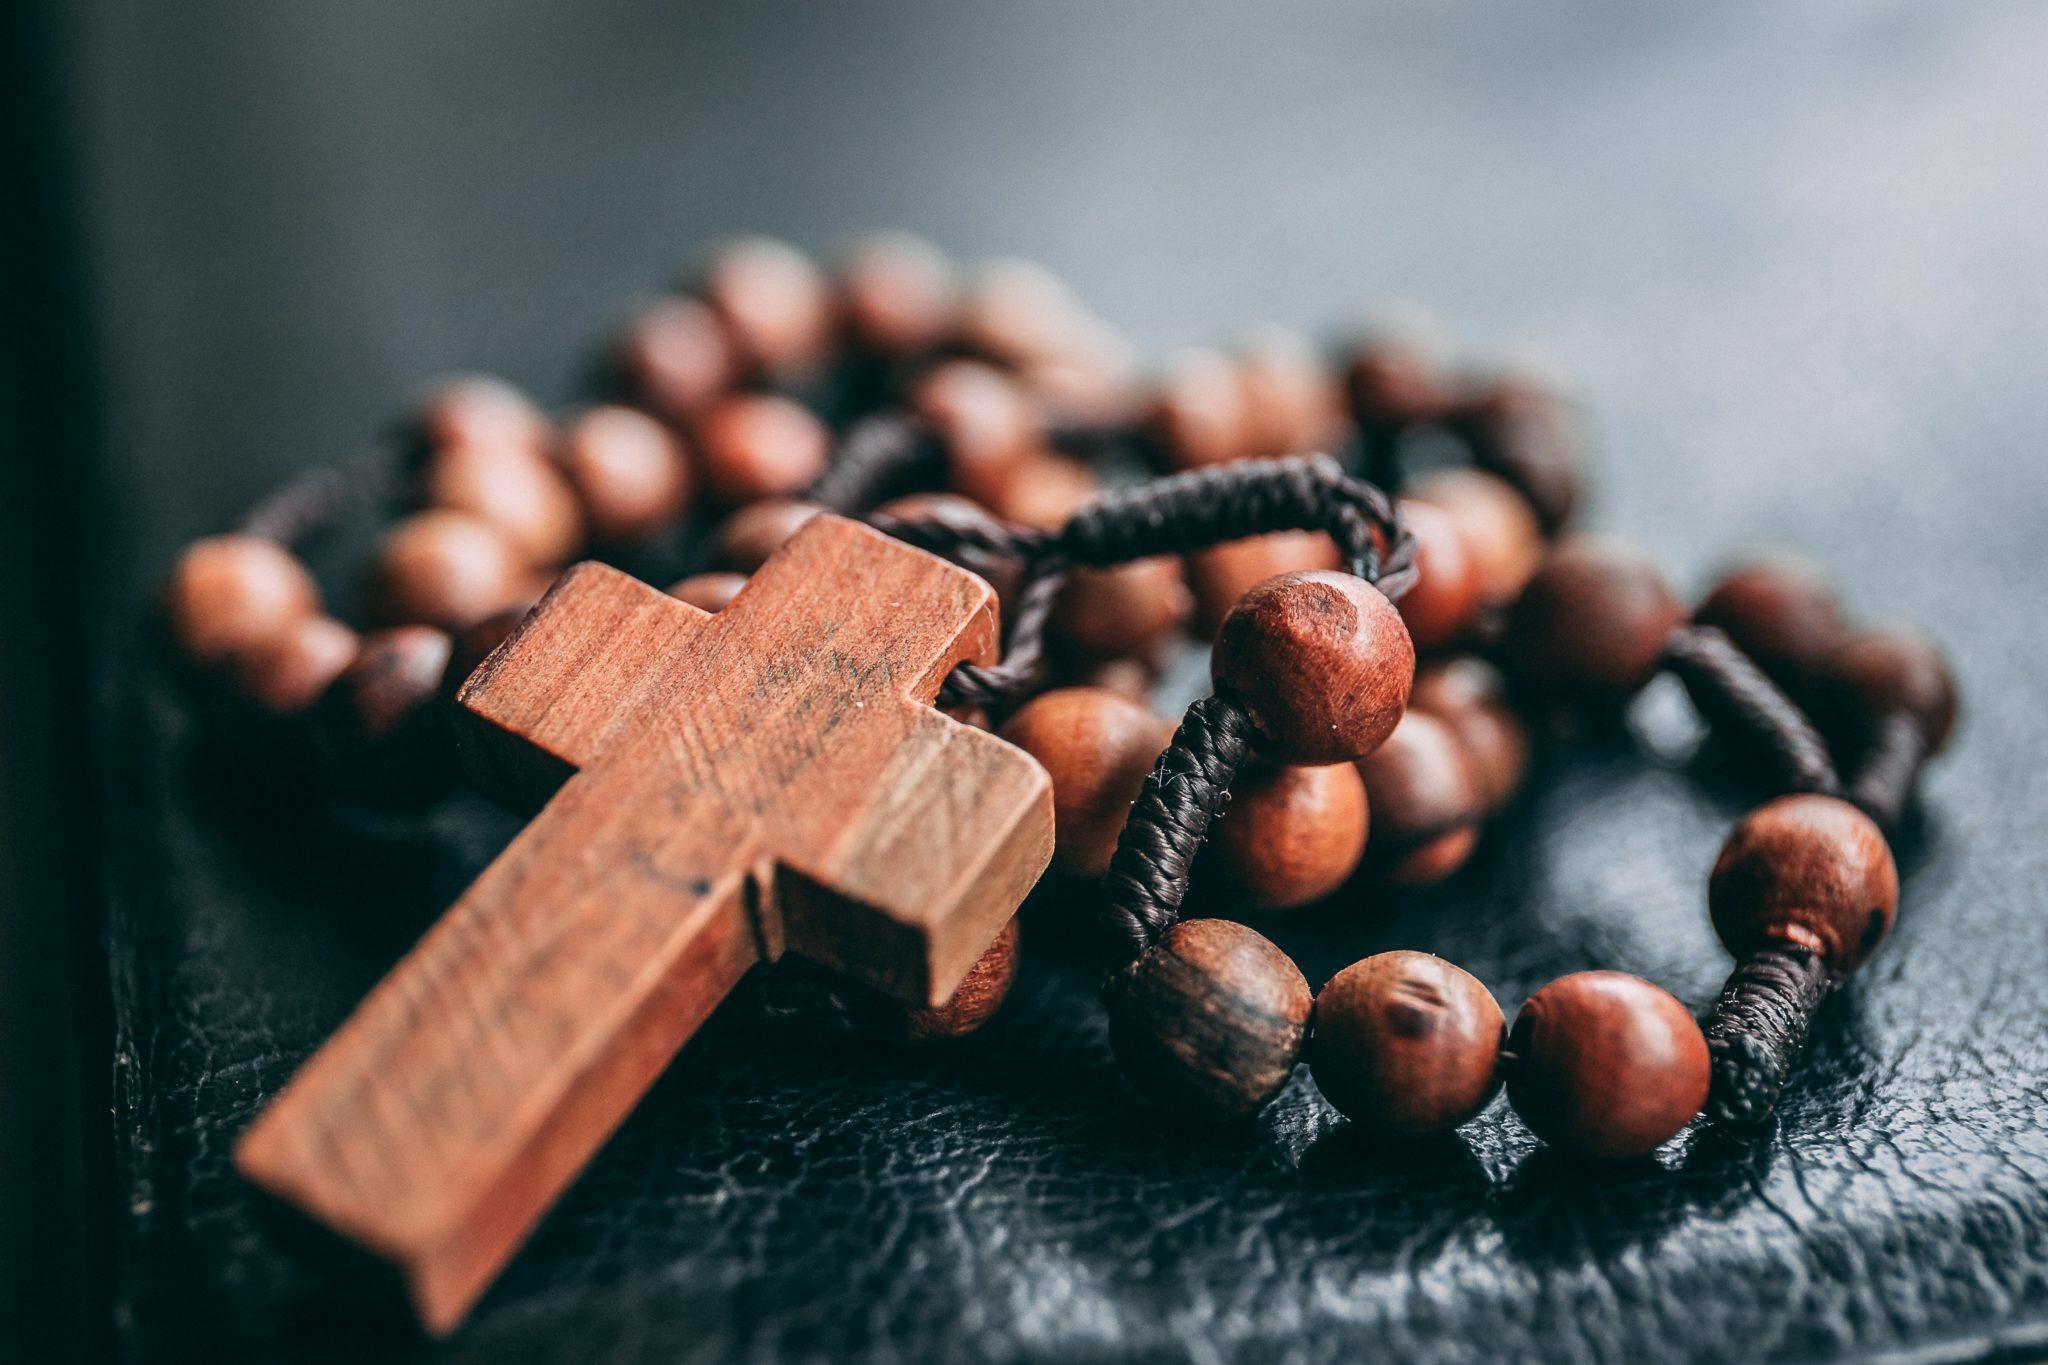 Kors i trä med halsband